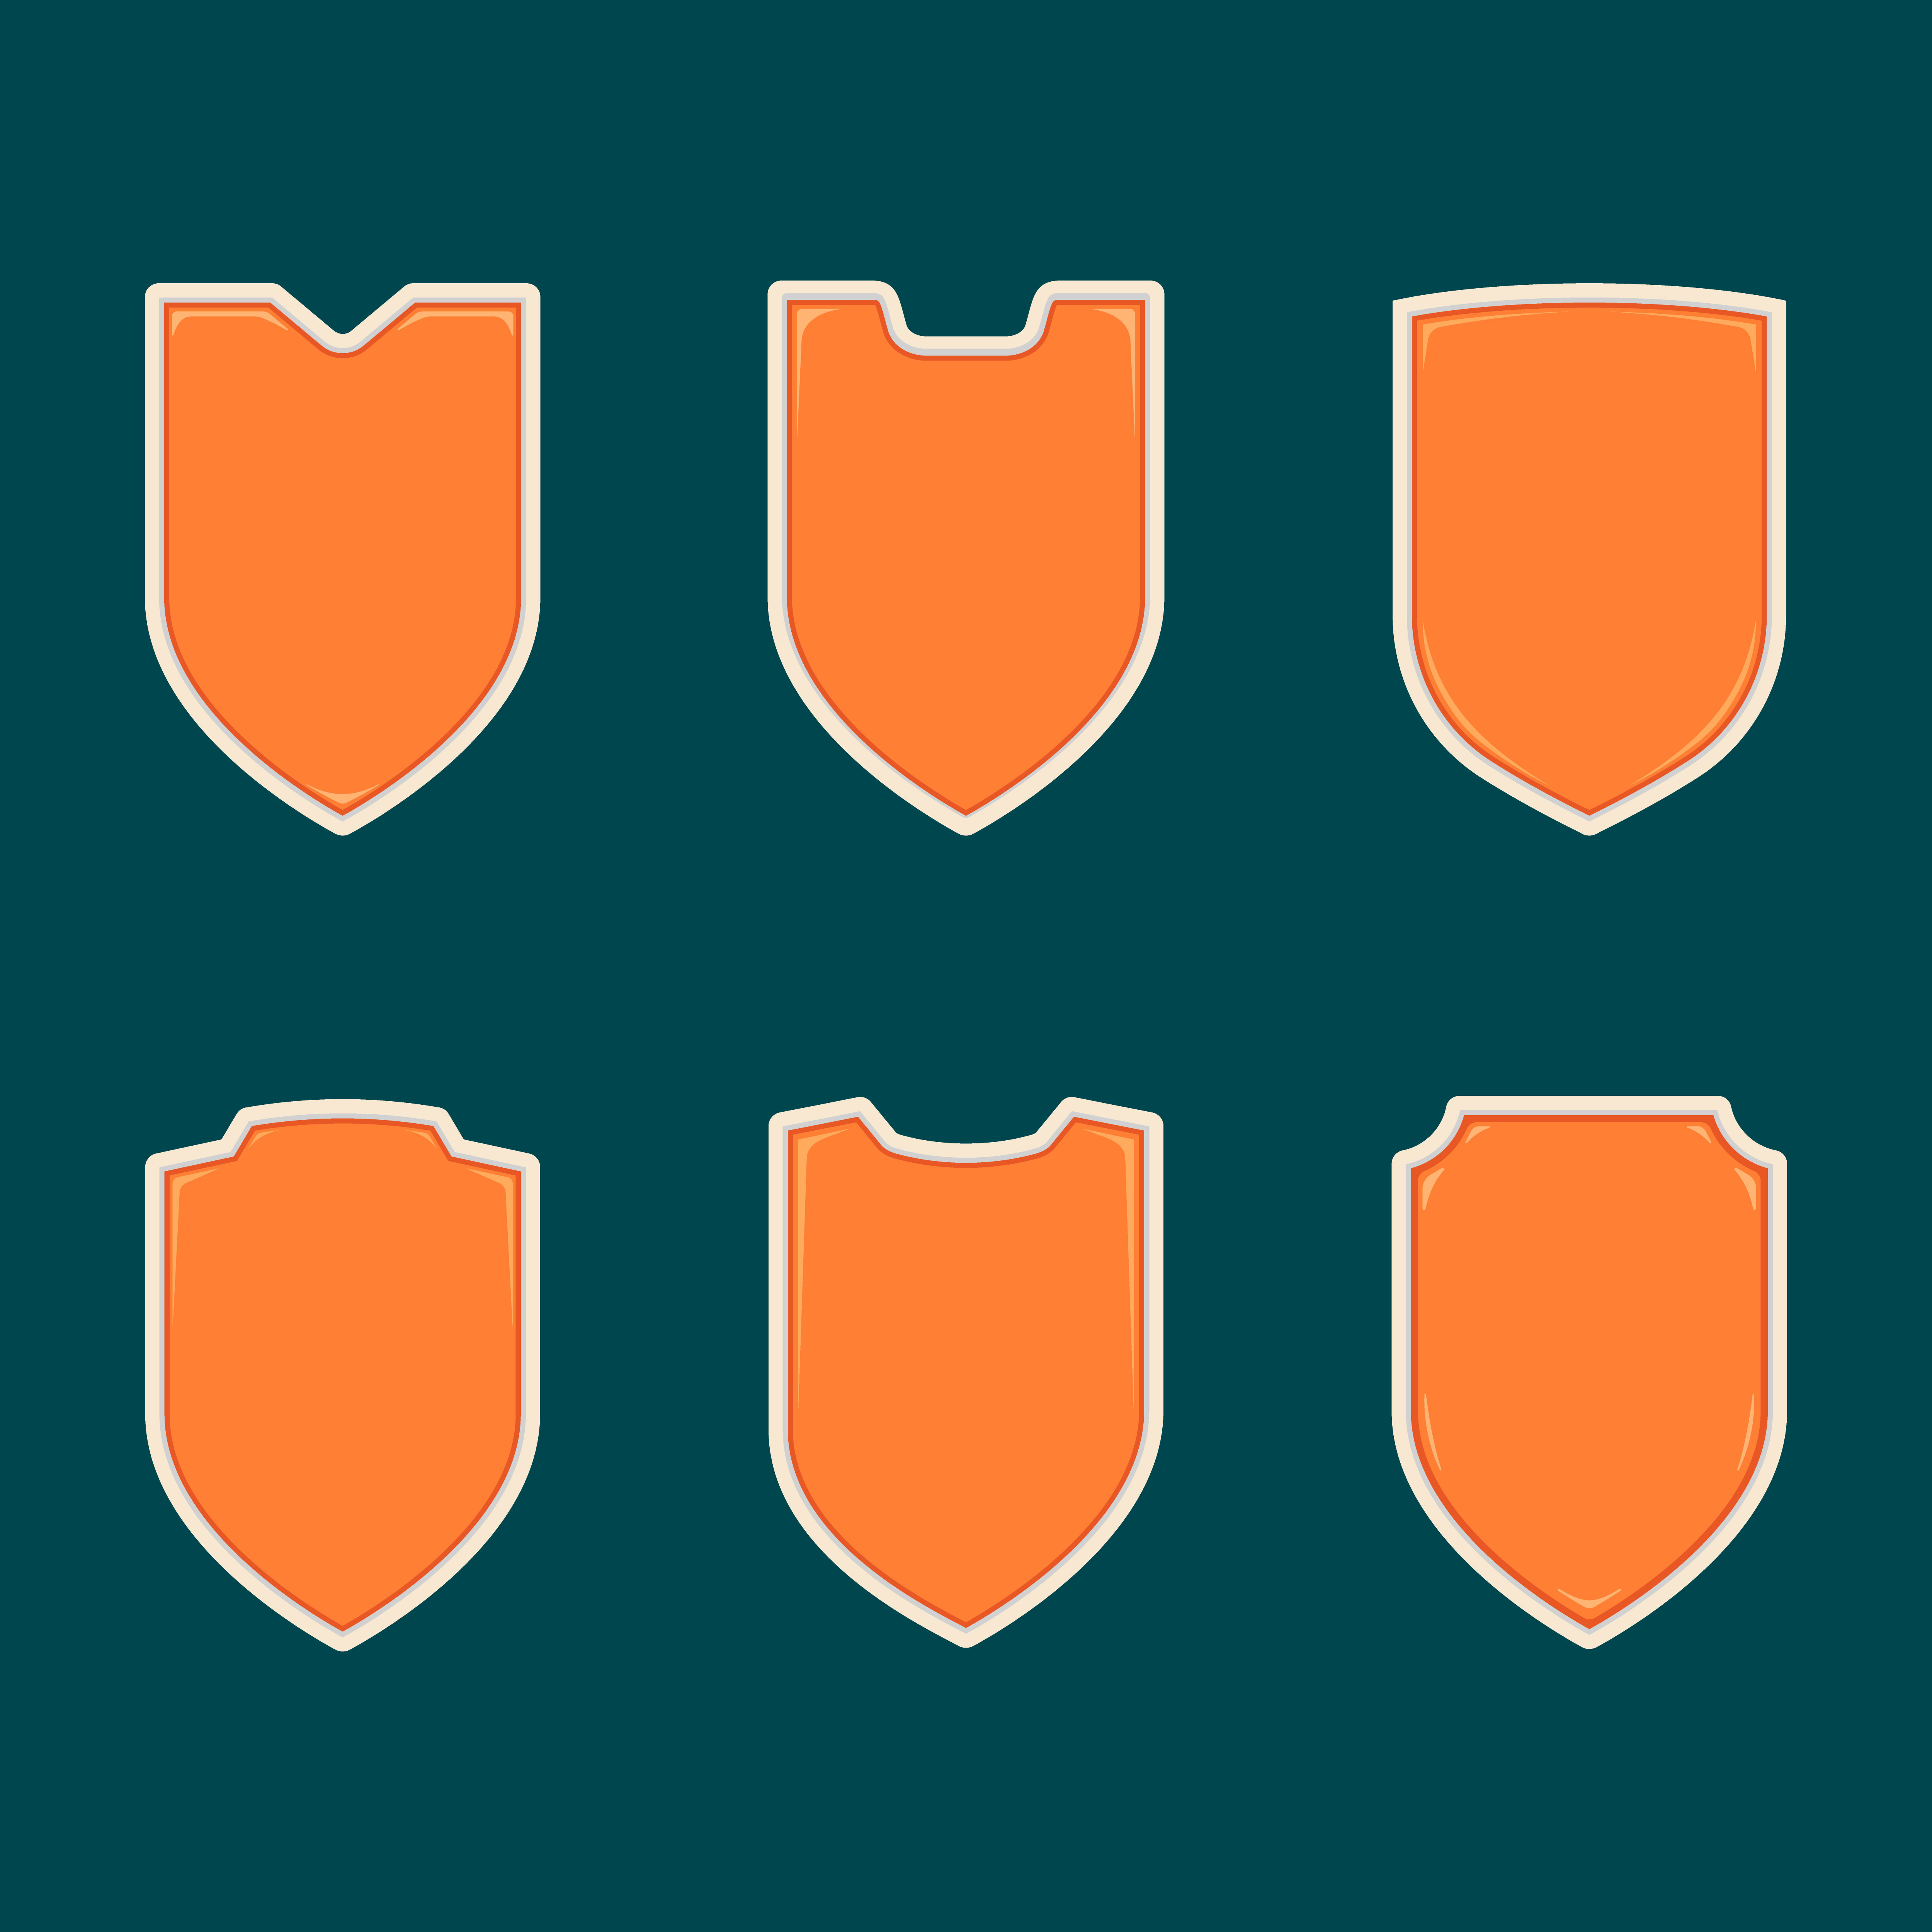 Blank Orange Shield Badge Shape Template Set Collection